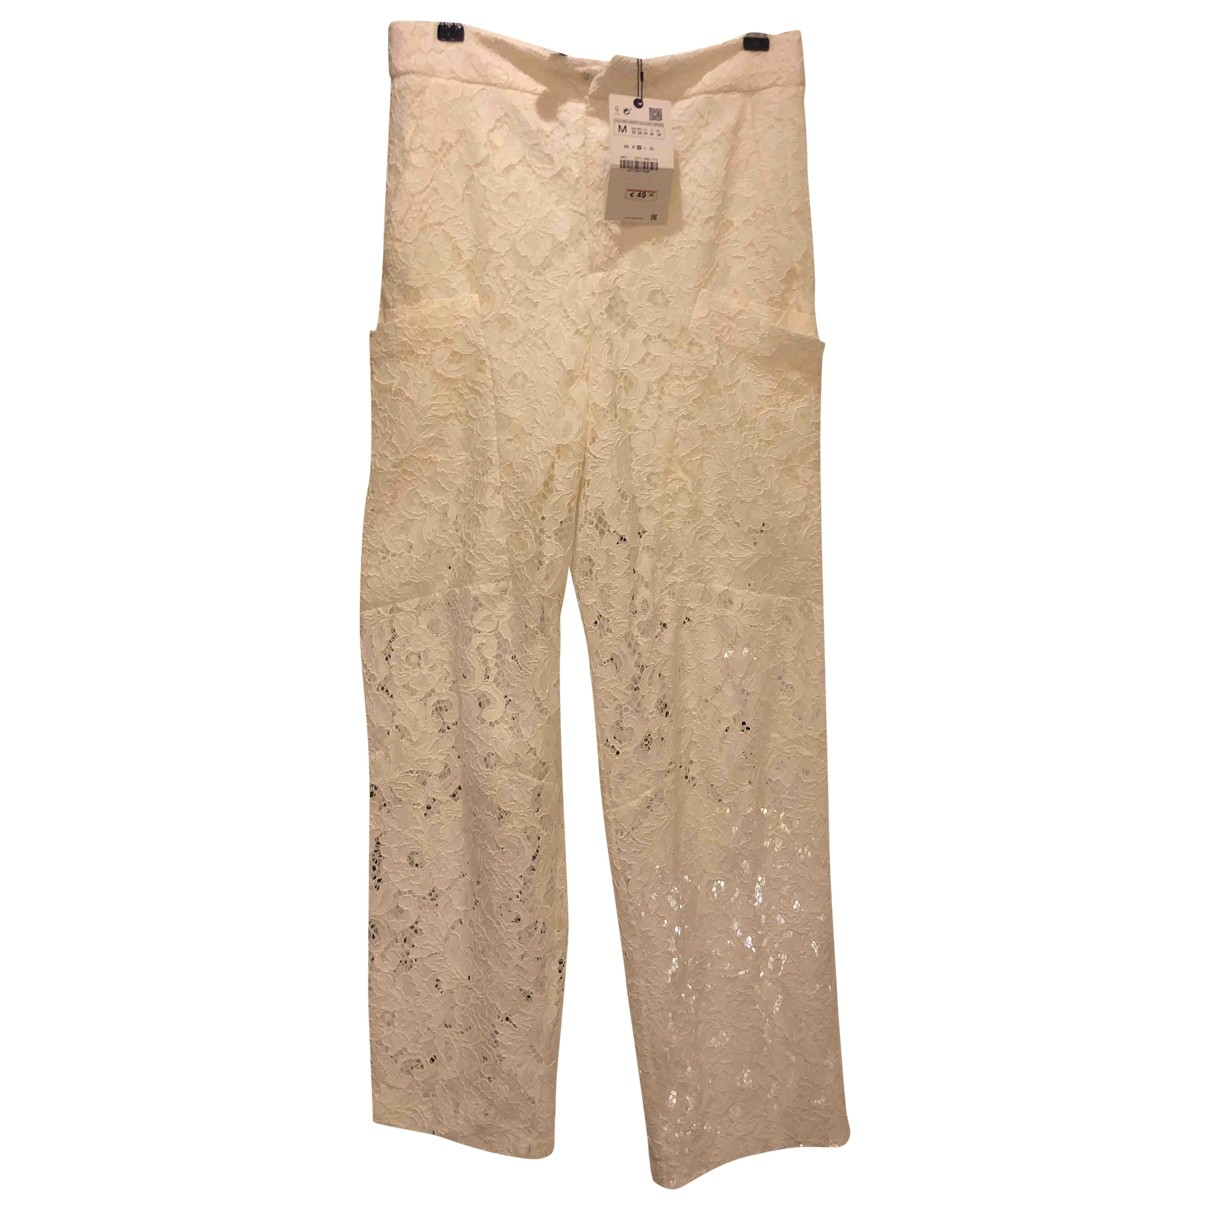 Zara \N White Trousers for Women M International